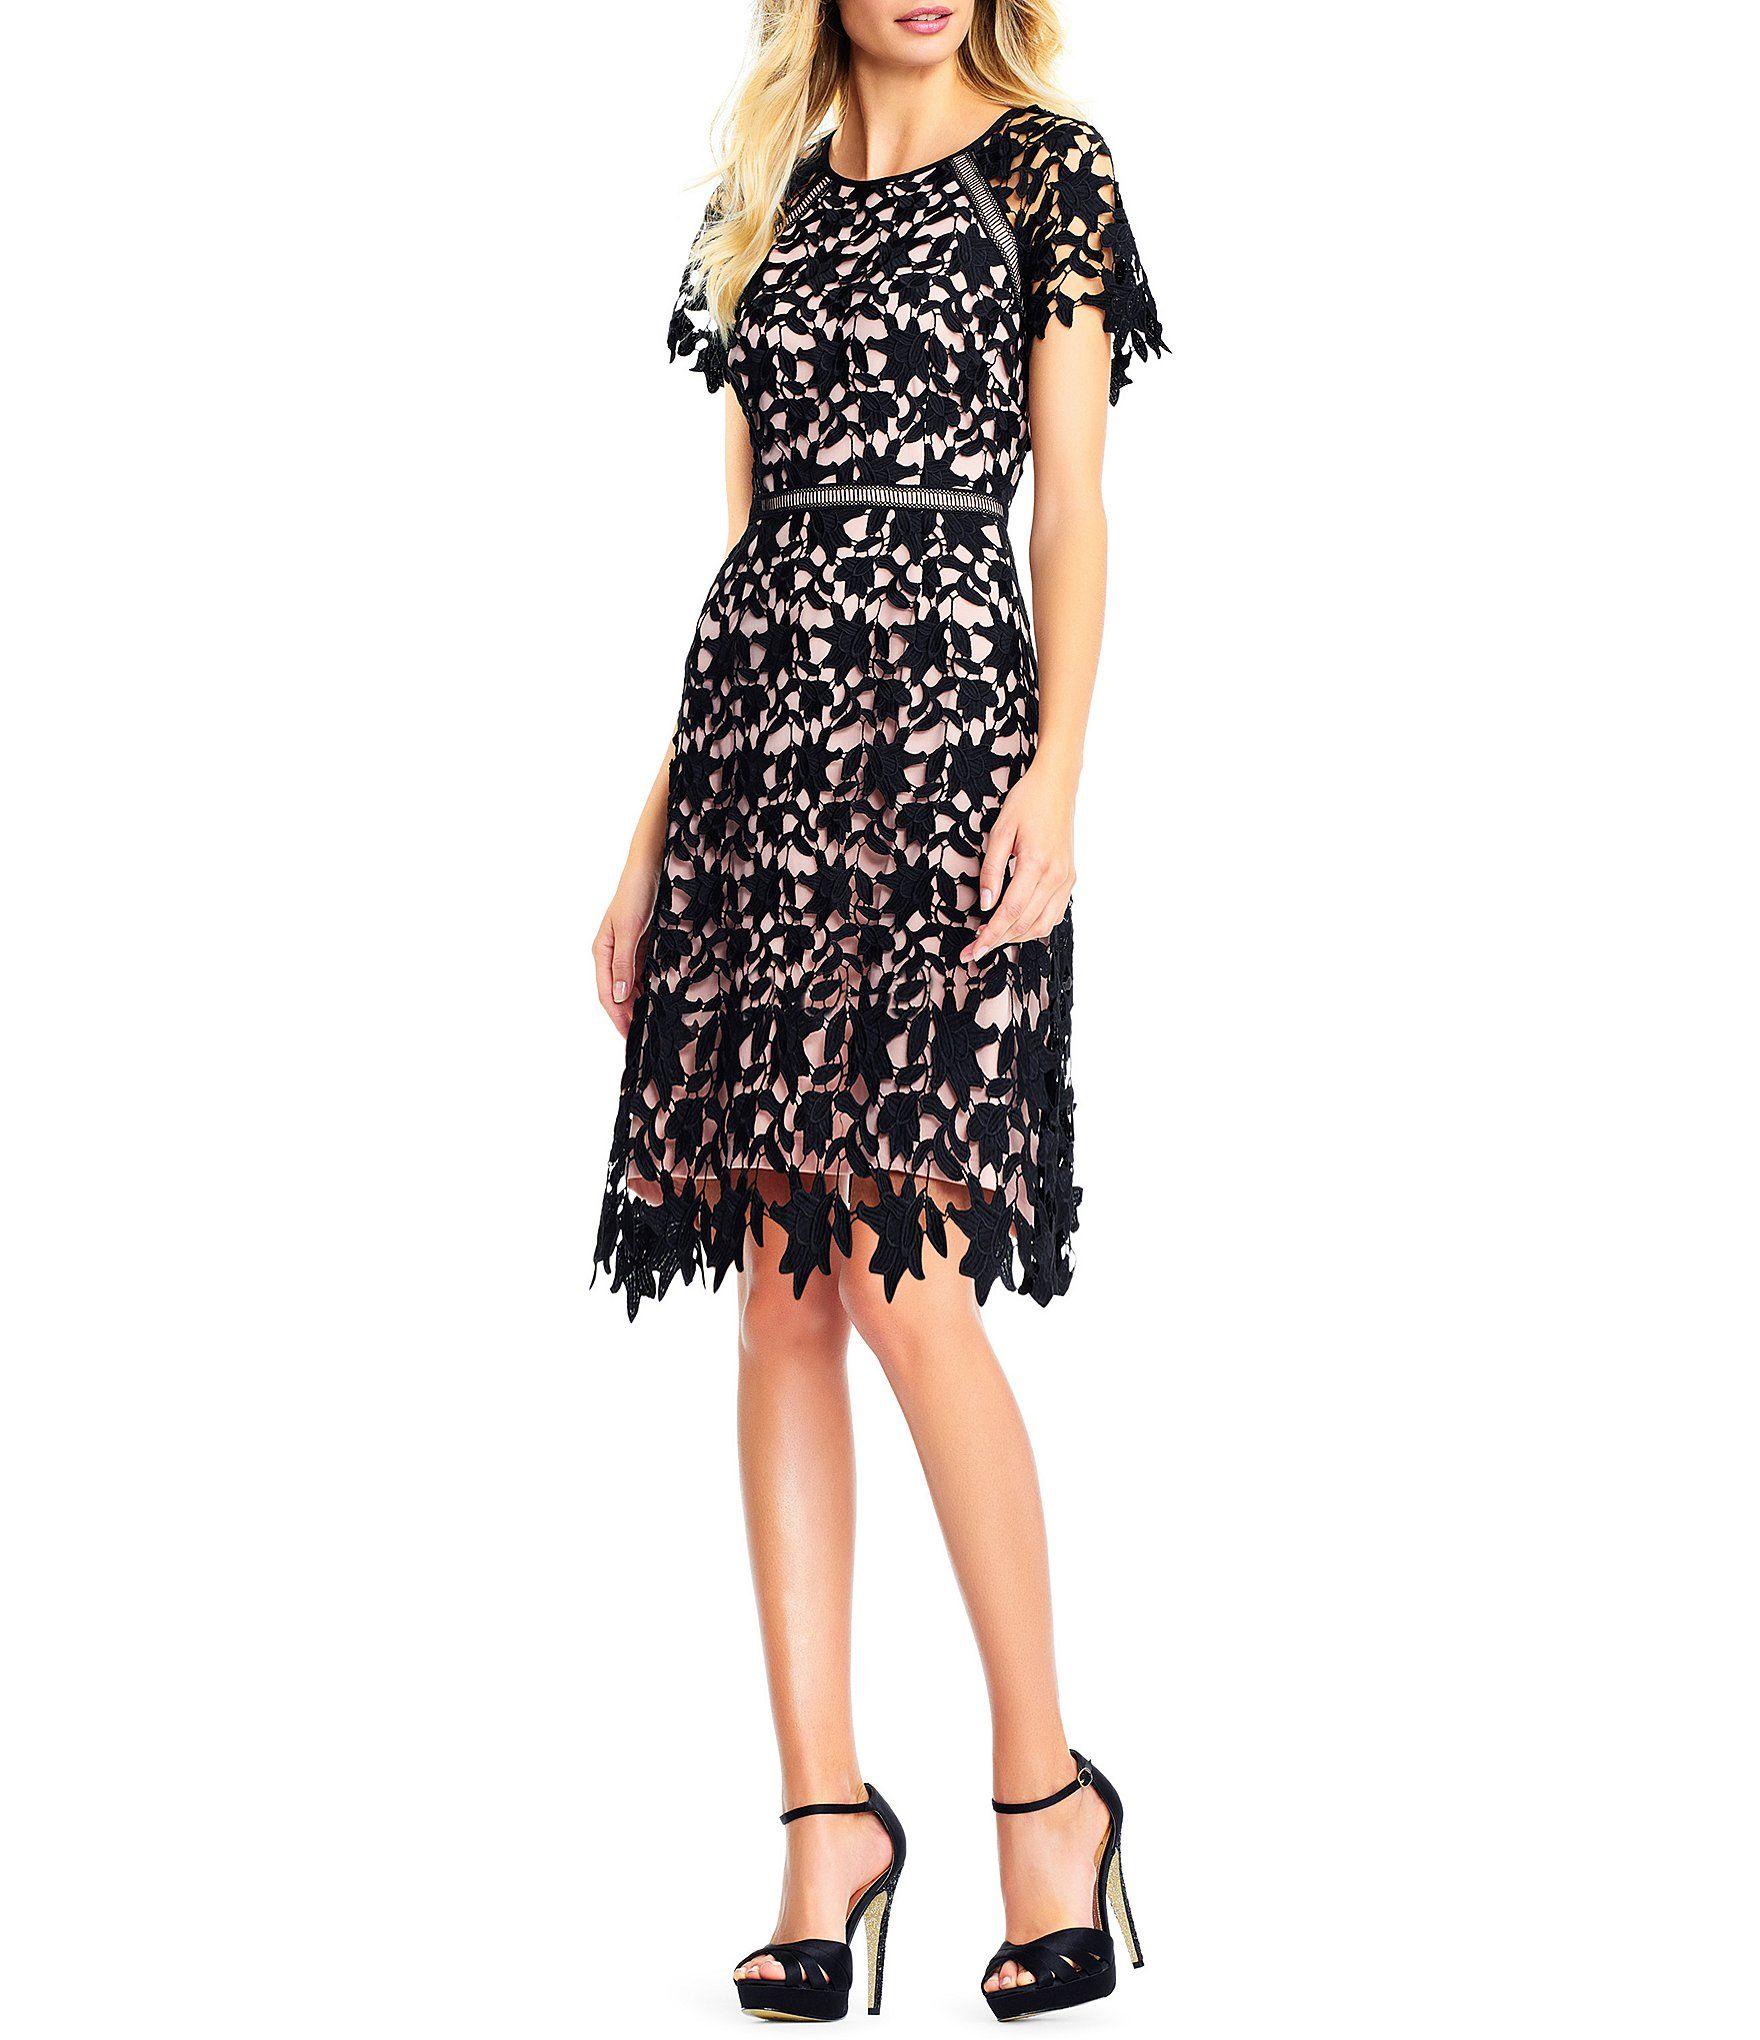 Shop For Adrianna Papell Lace A Line Dress At Dillardscom